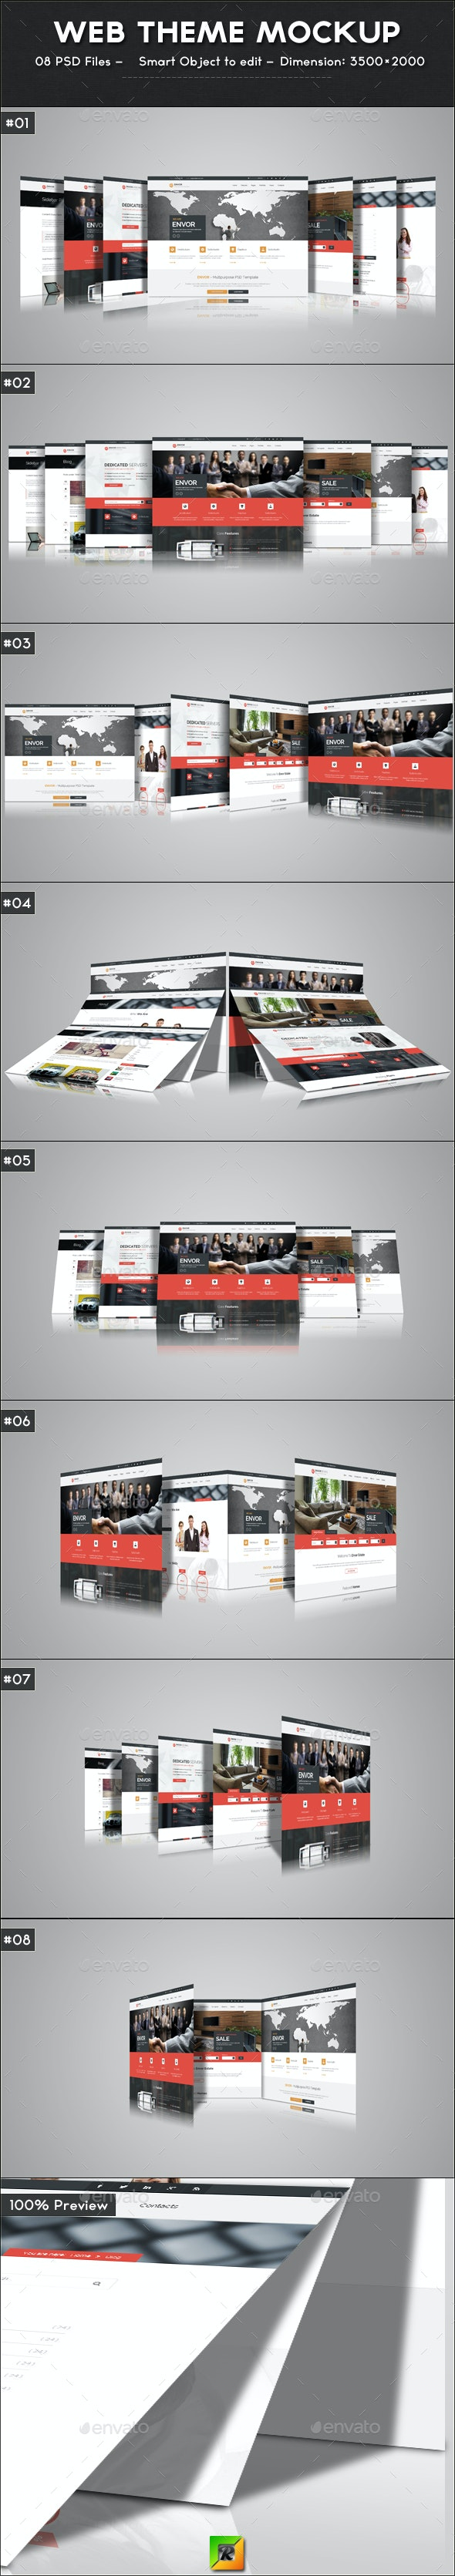 Web Theme Mockup - Website Displays